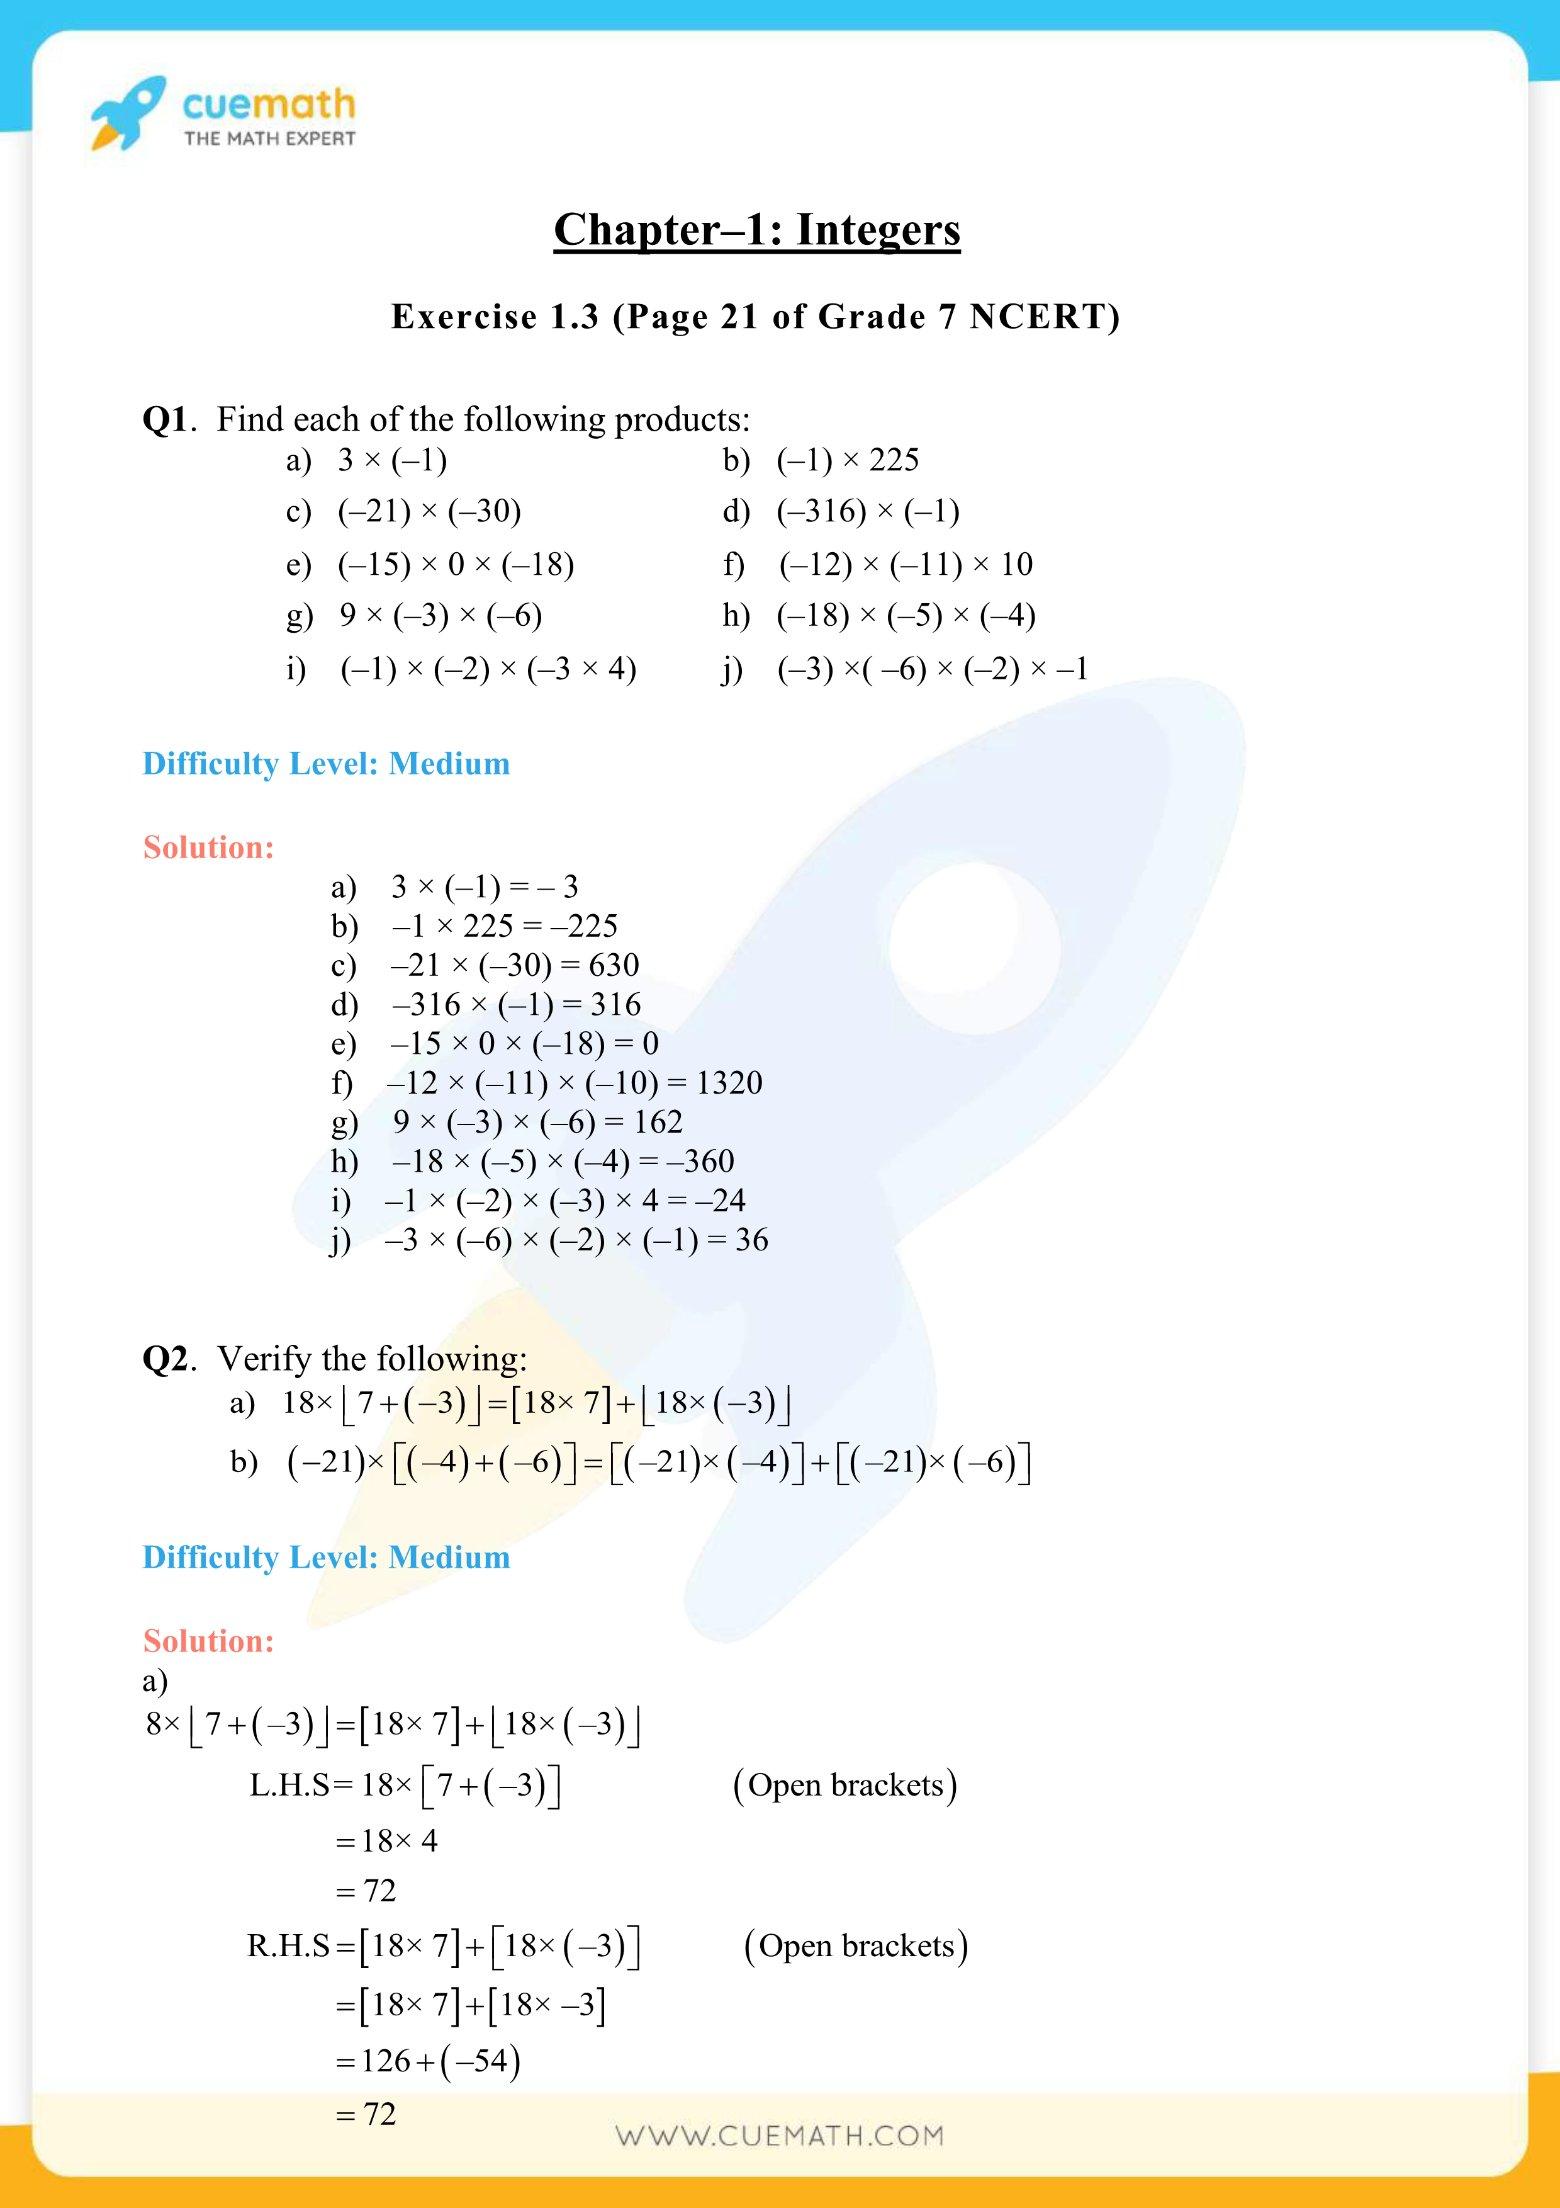 NCERT Solutions Class 7 Maths Chapter 1 Exercise 1.3